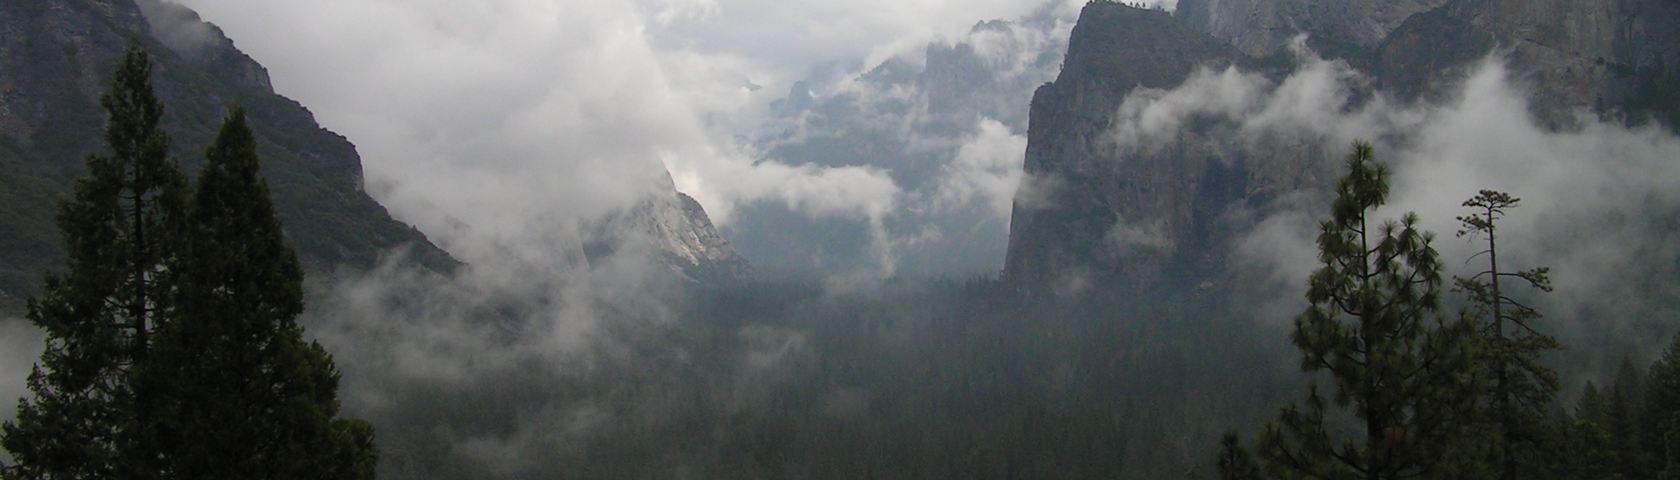 Clouds over Yosemite